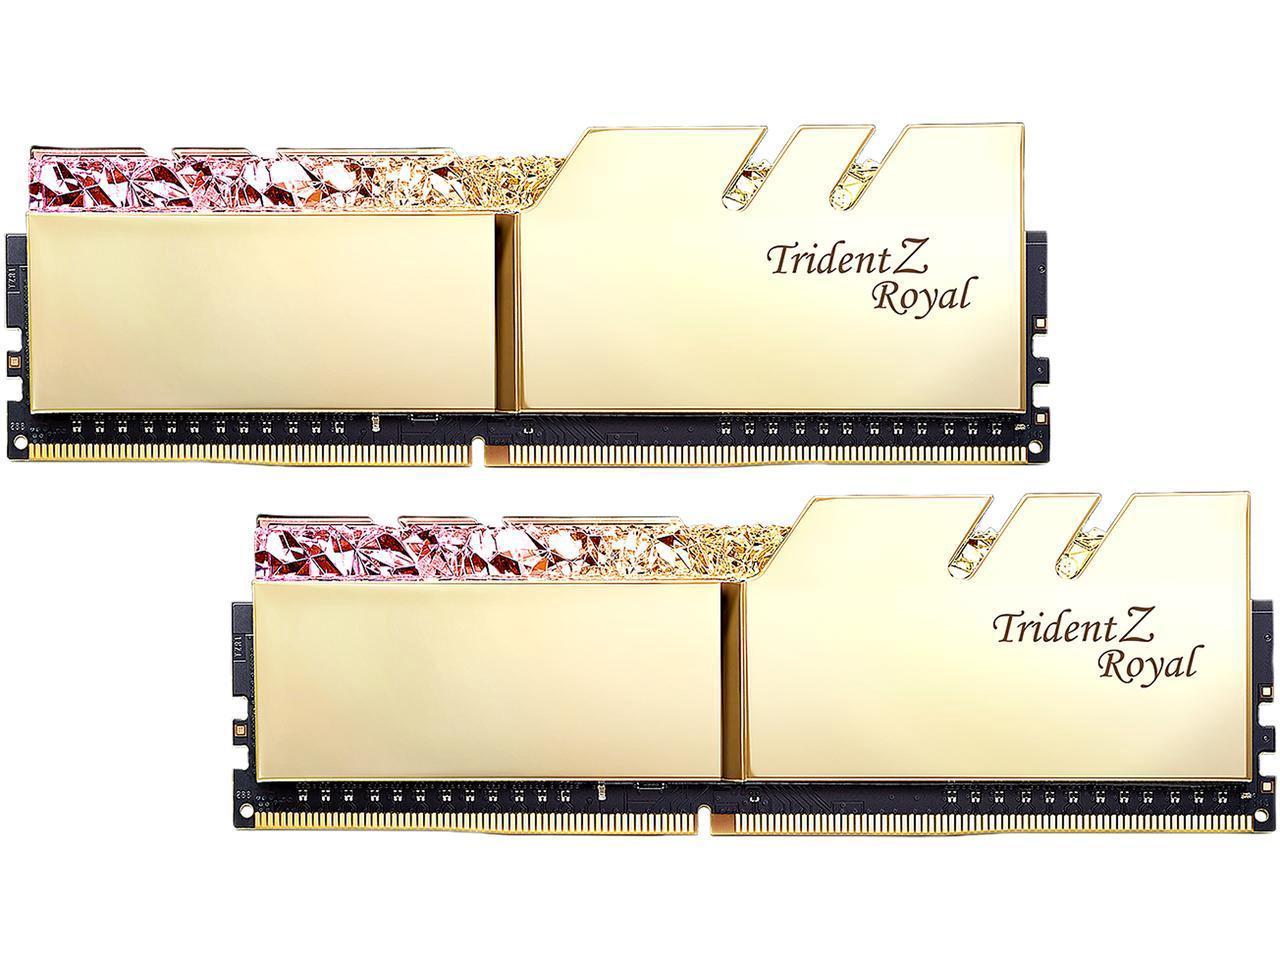 Review: G Skill Trident Z Royal 16GB DDR4-3200 (F4-3200C16D